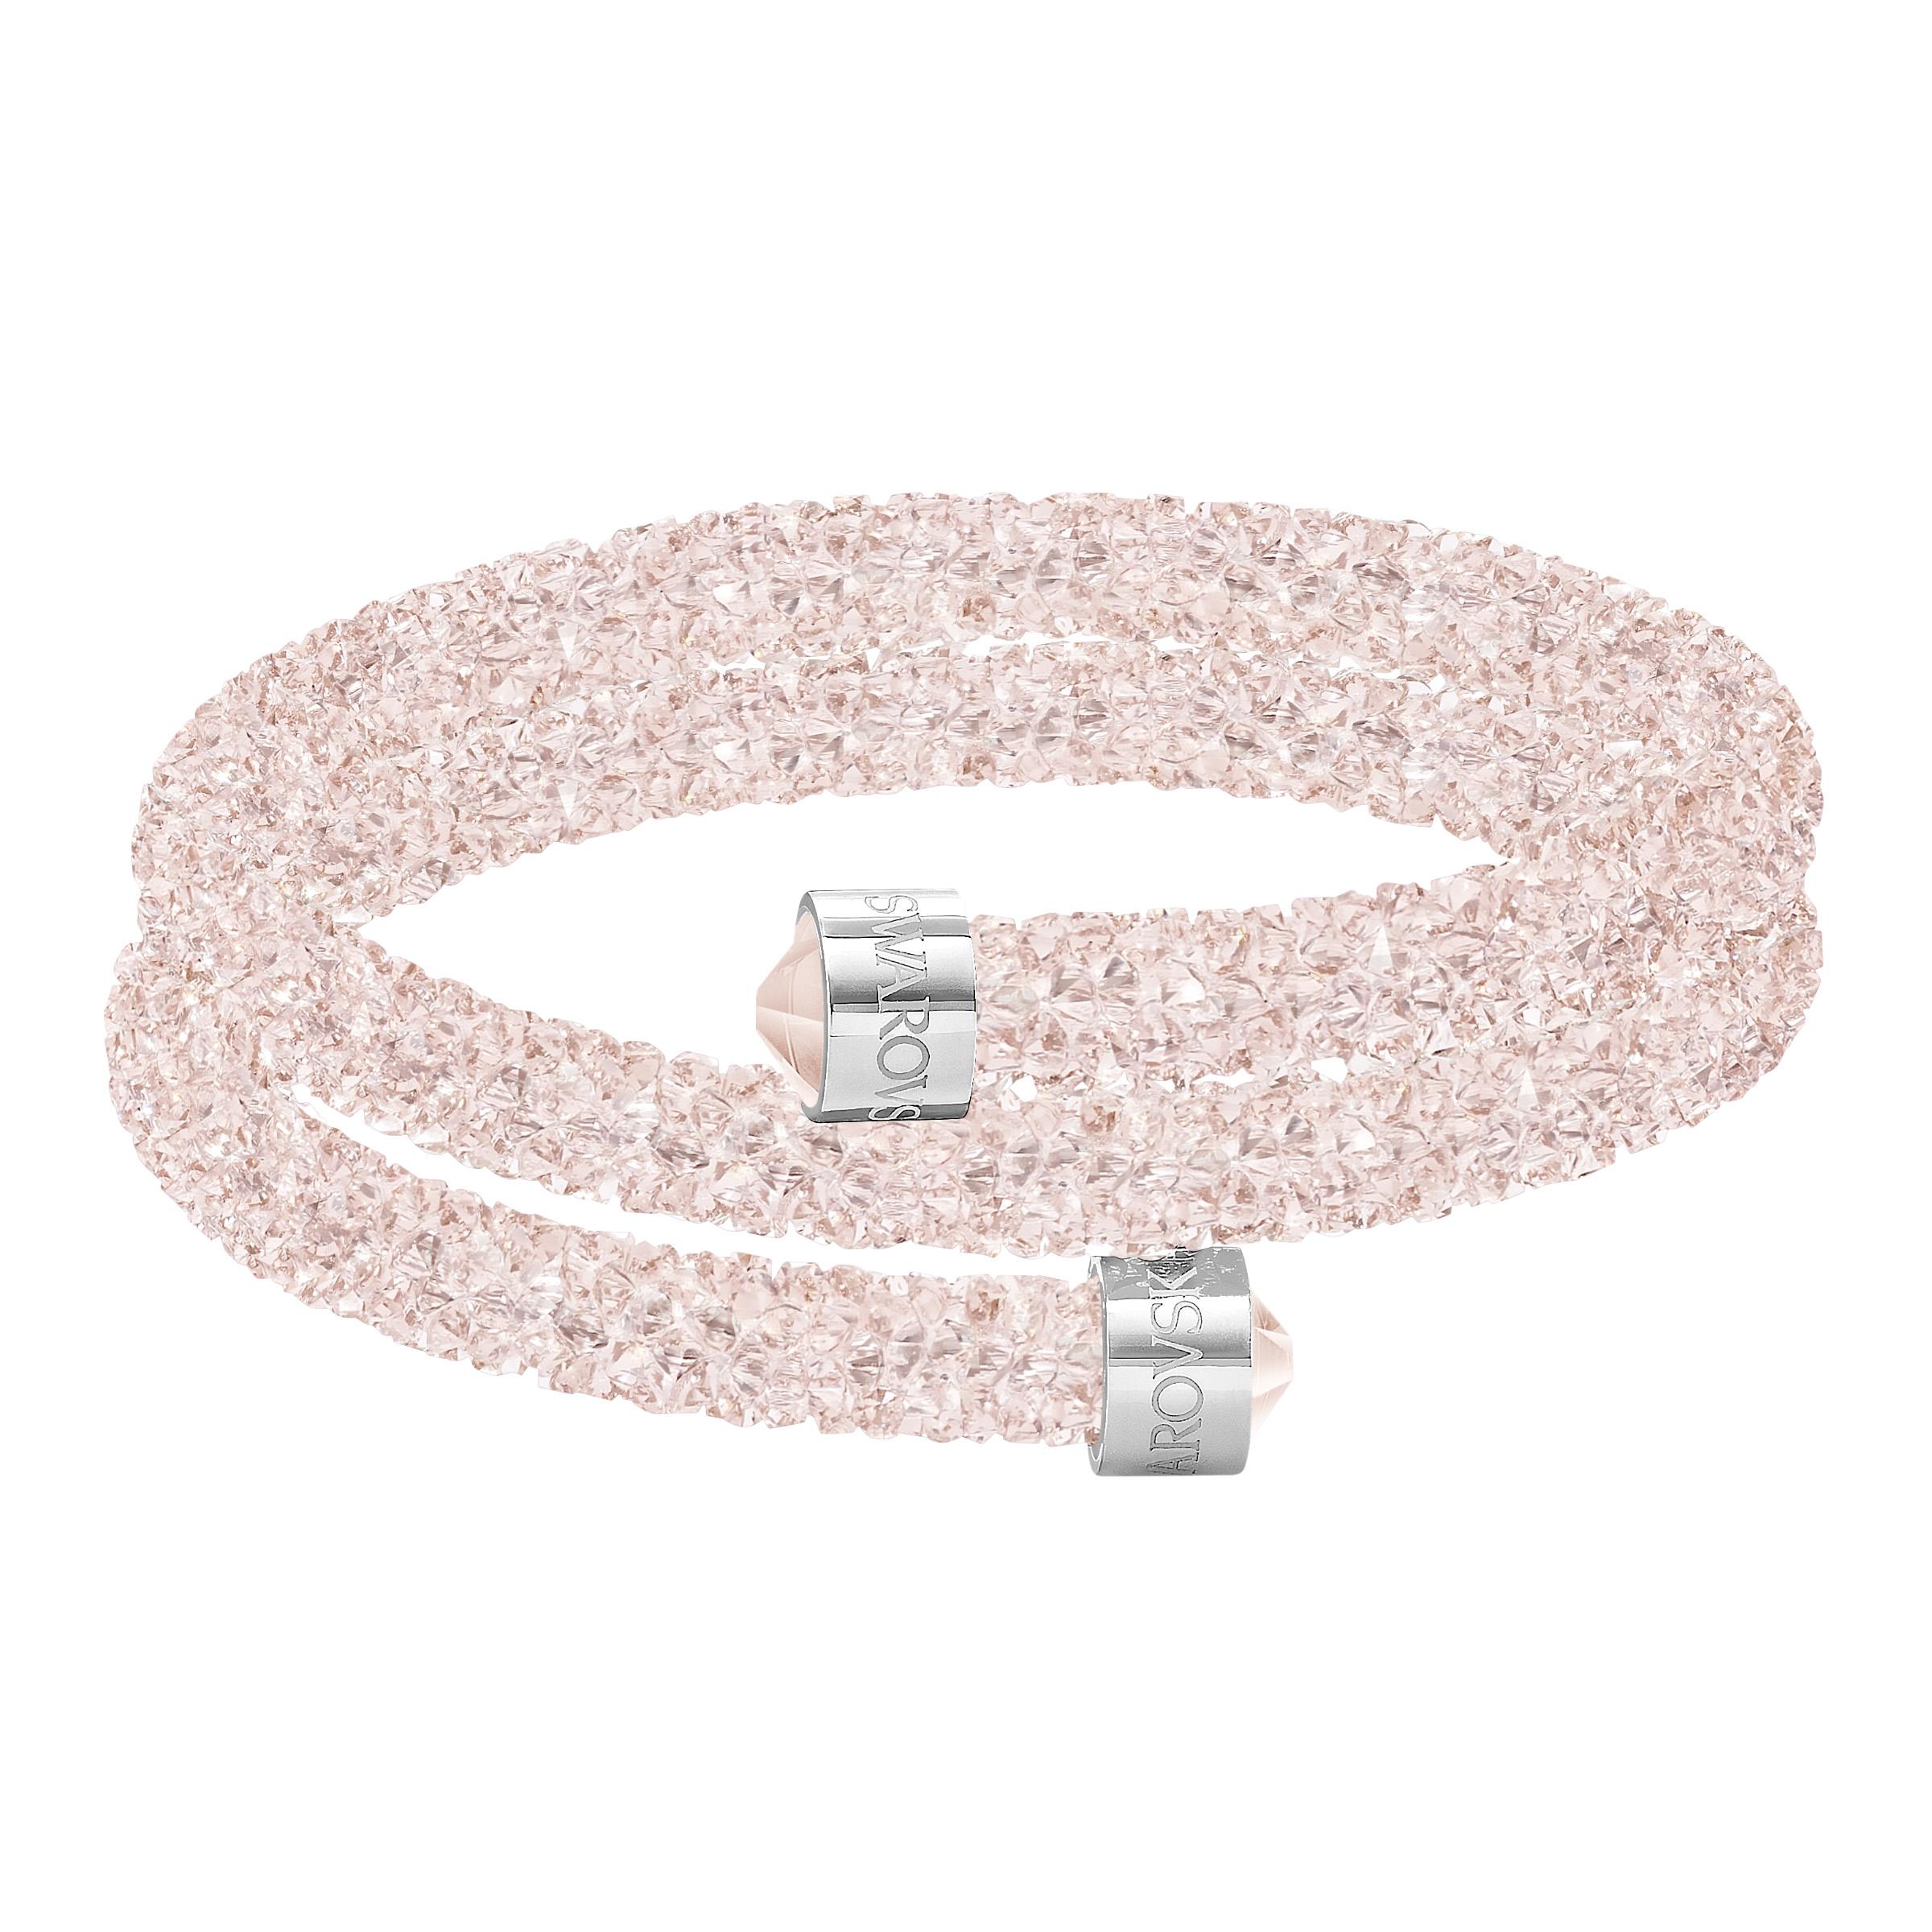 Bracelet-jonc Swarovski double Crystaldust, rose, acier inoxydable